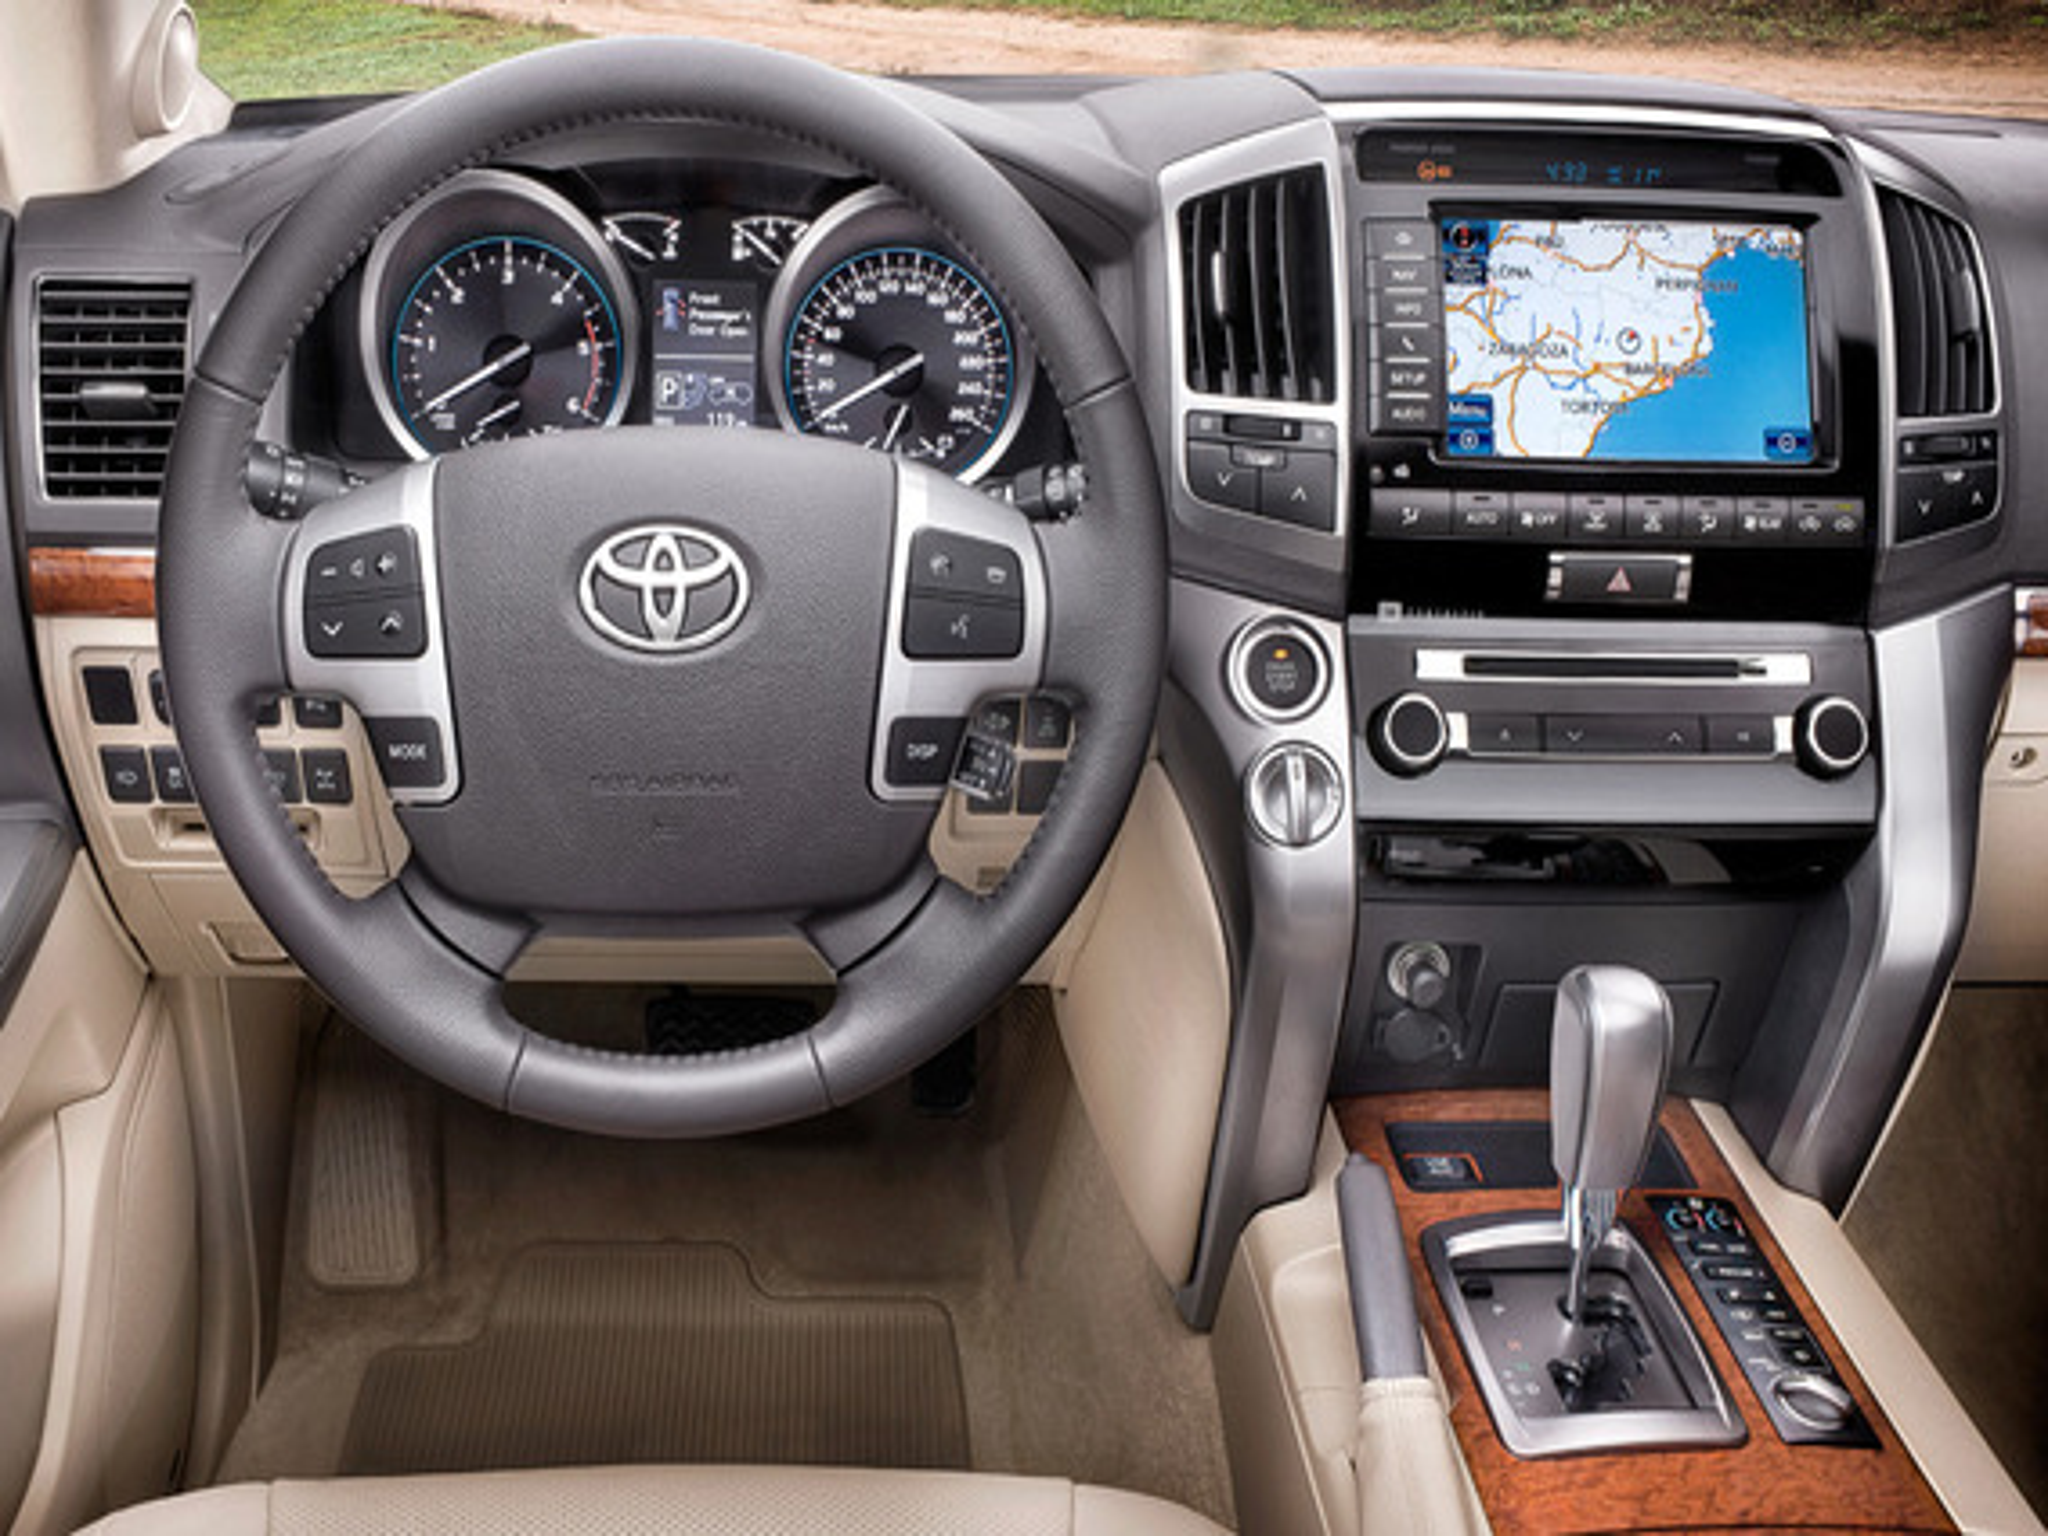 Какой расход топлива у Toyota Land Cruiser 200?